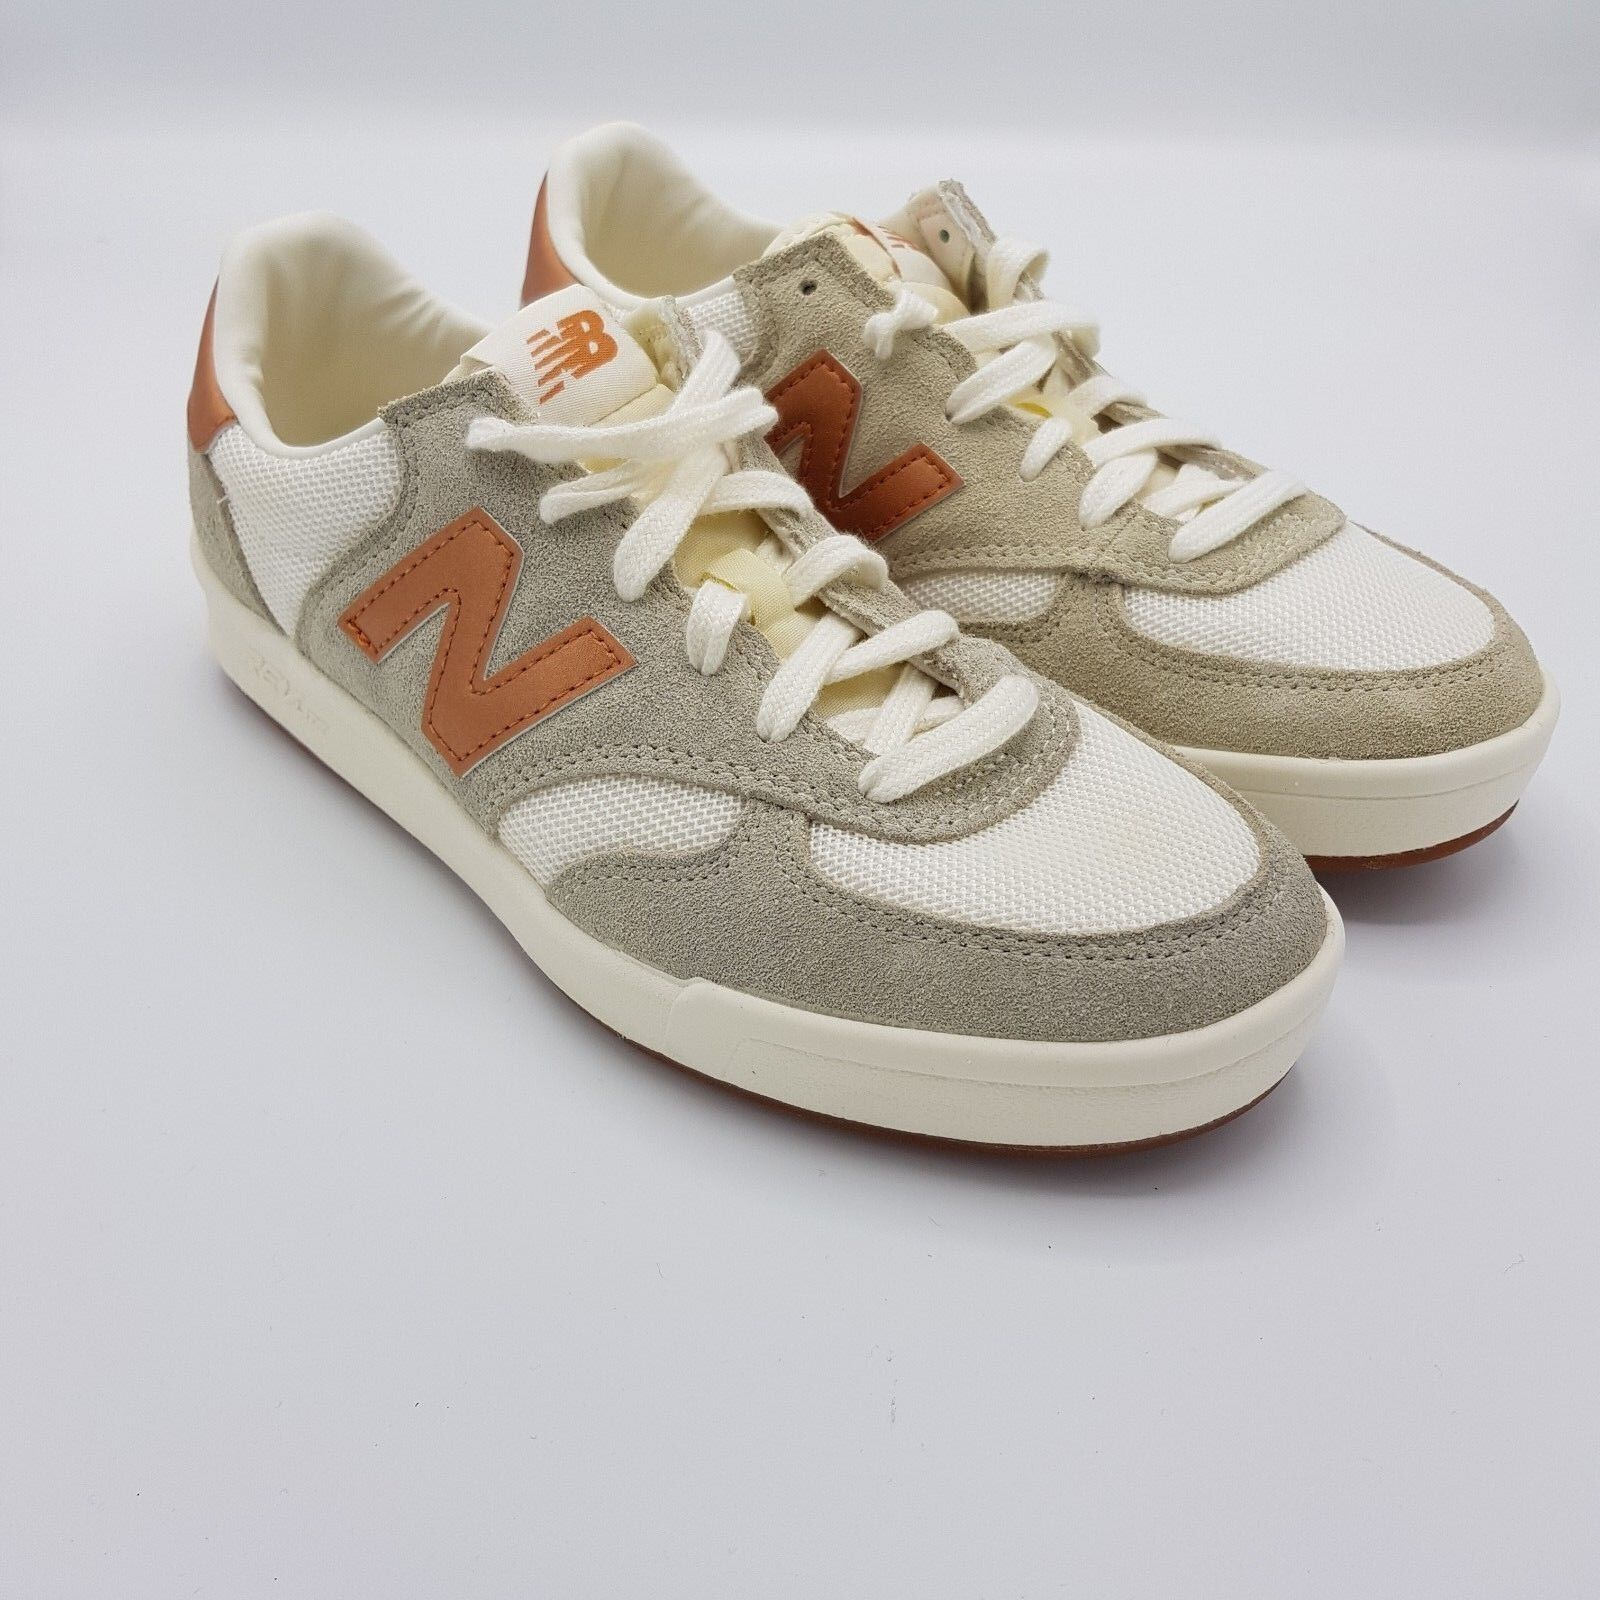 New Balance WRT300MA Damen Damen Damen Schuhe Sneakers Beige / Weiß 825838